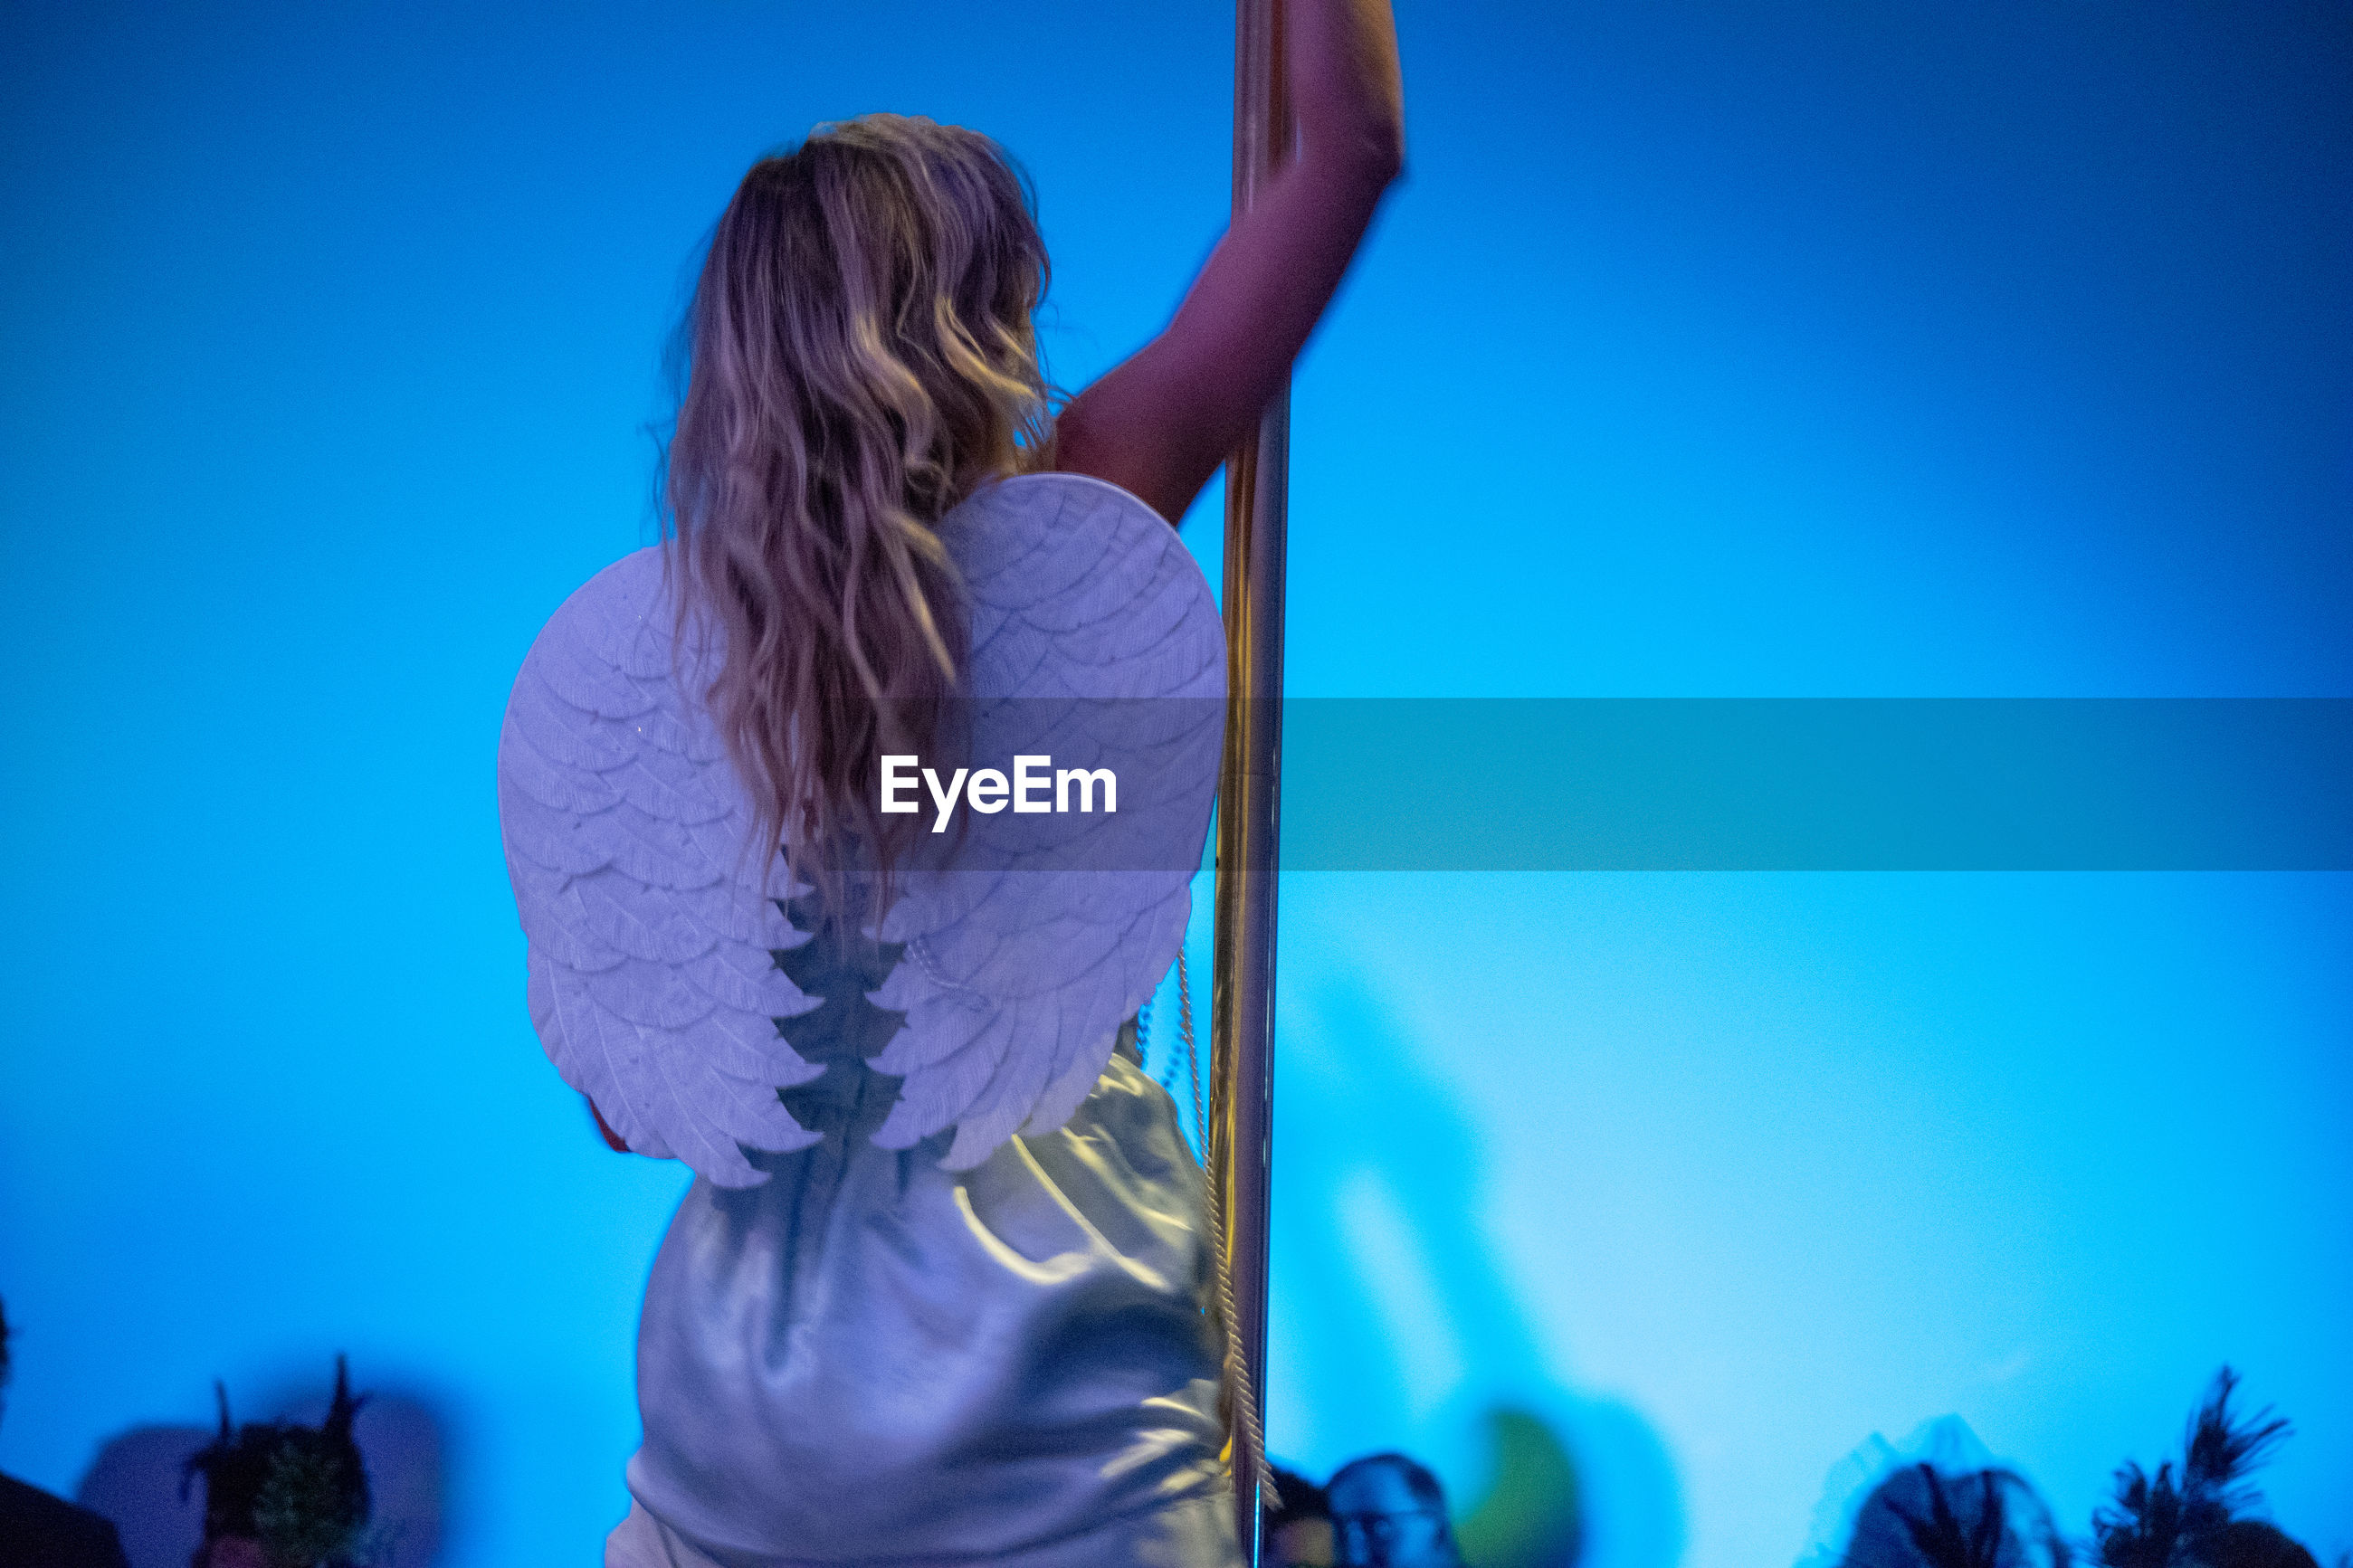 Rear view of woman pole dancing at nightclub